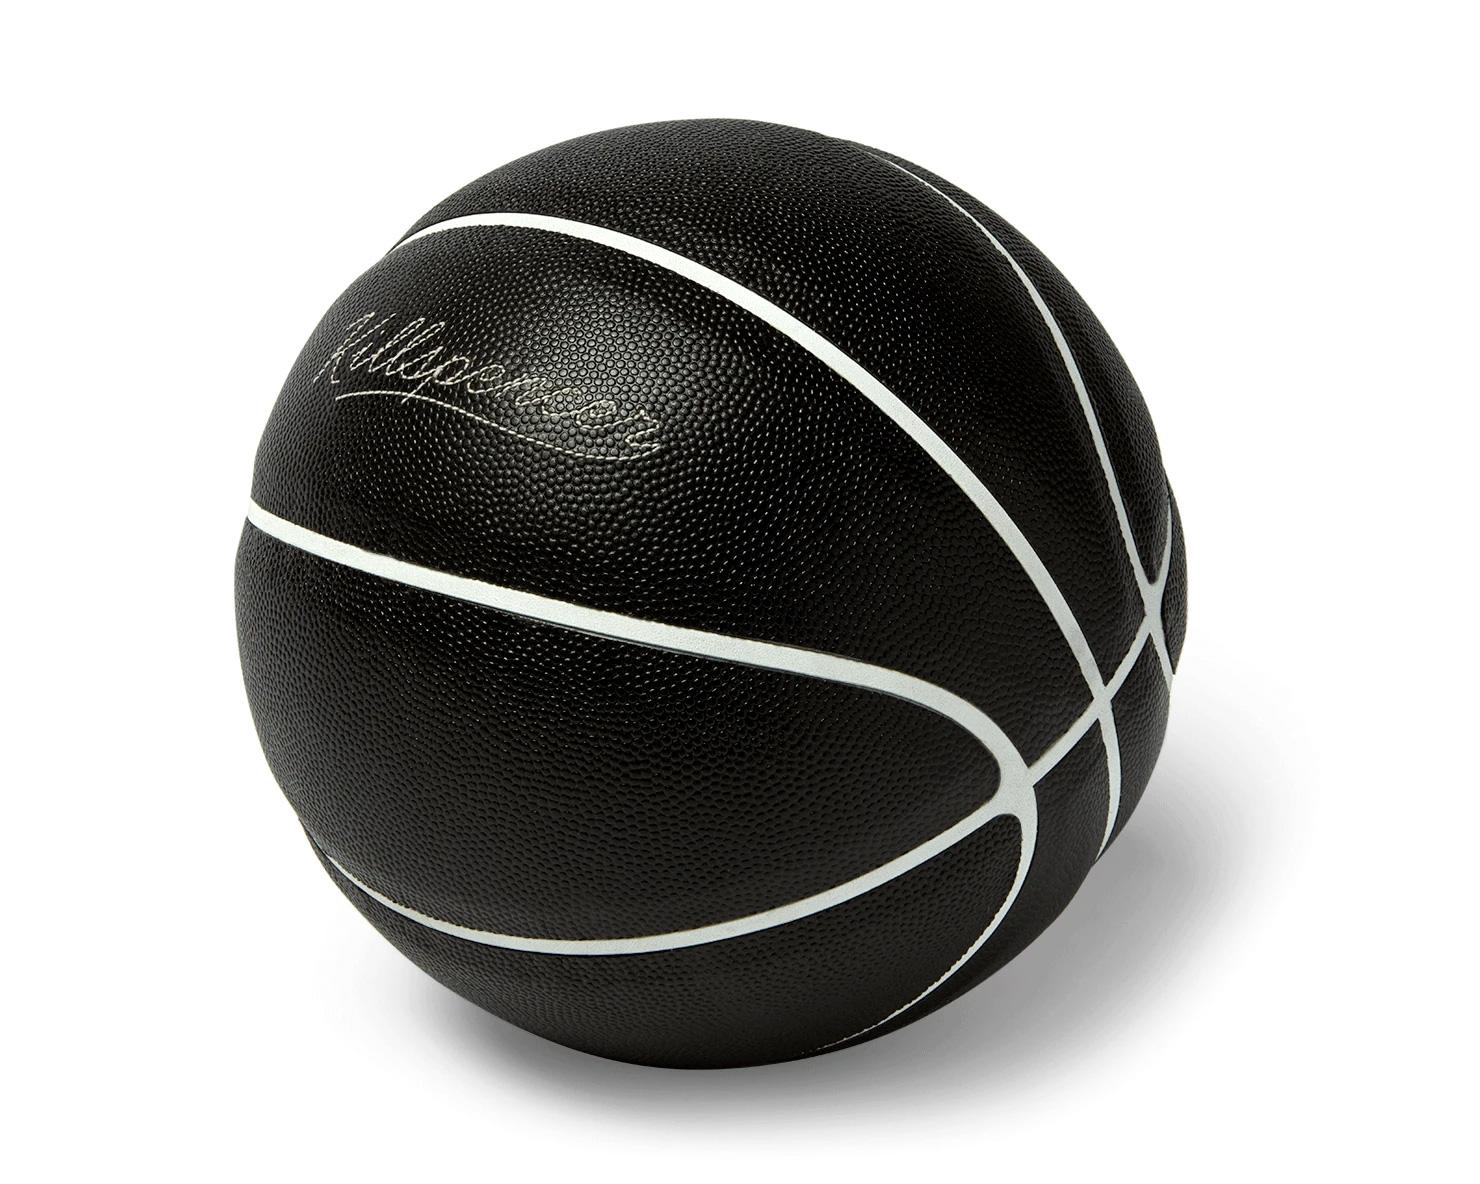 The Killspencer Basketball is Lowkey Baller at werd.com